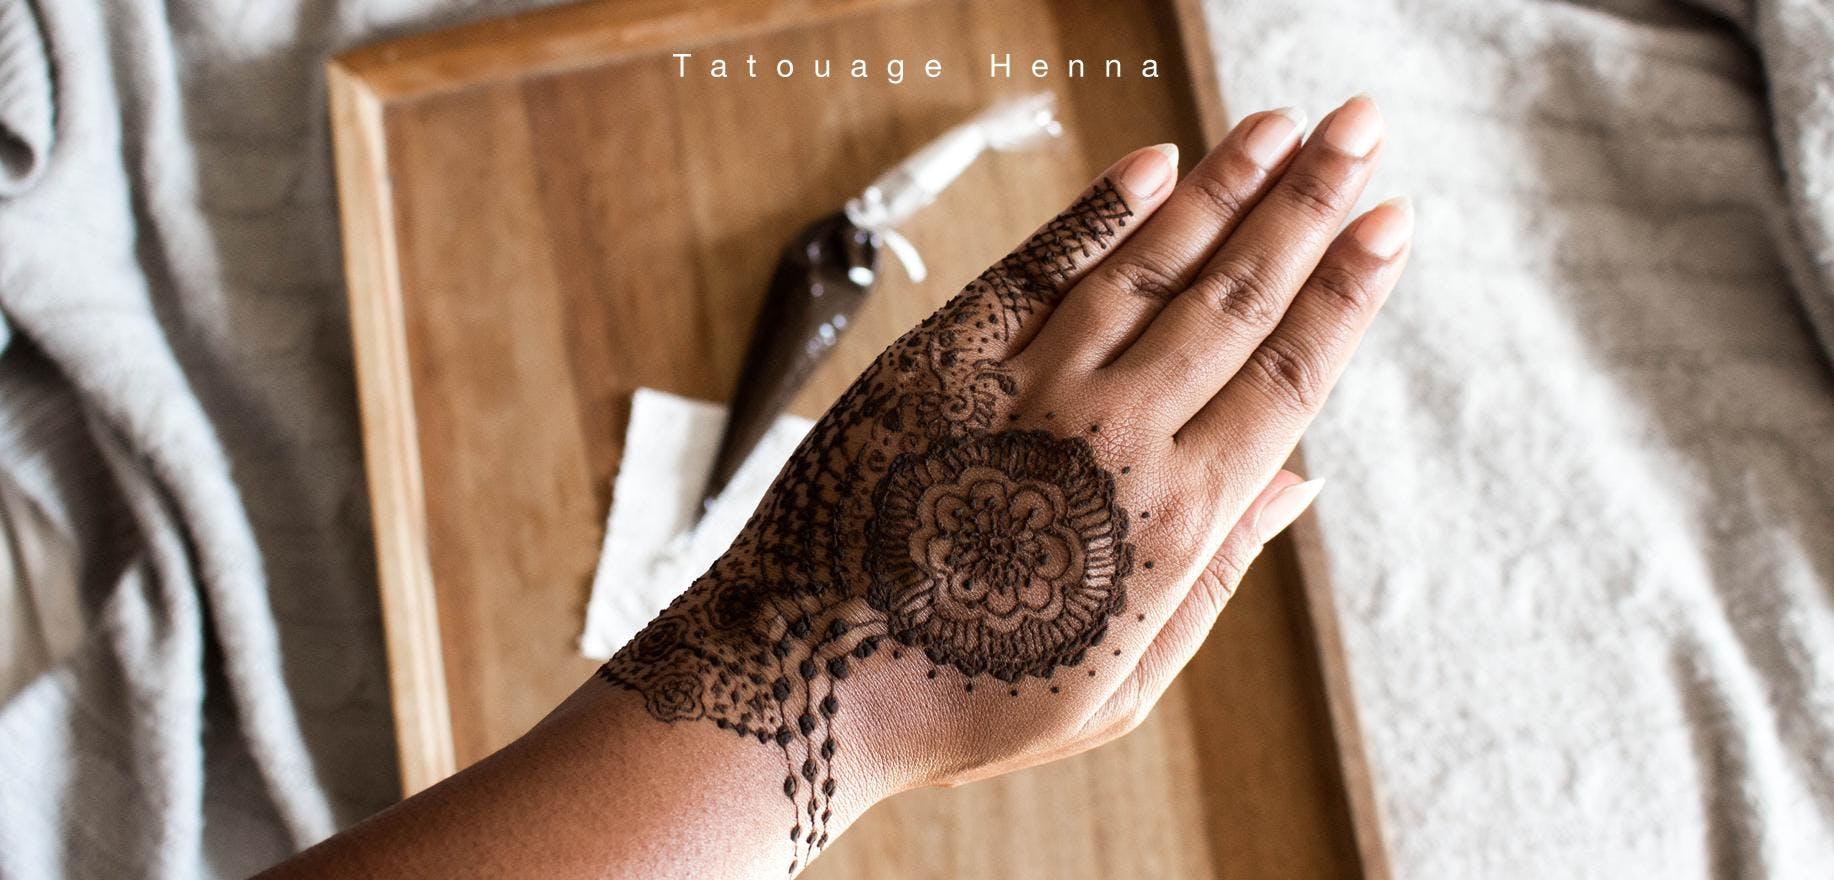 Tatouage Henna nov16